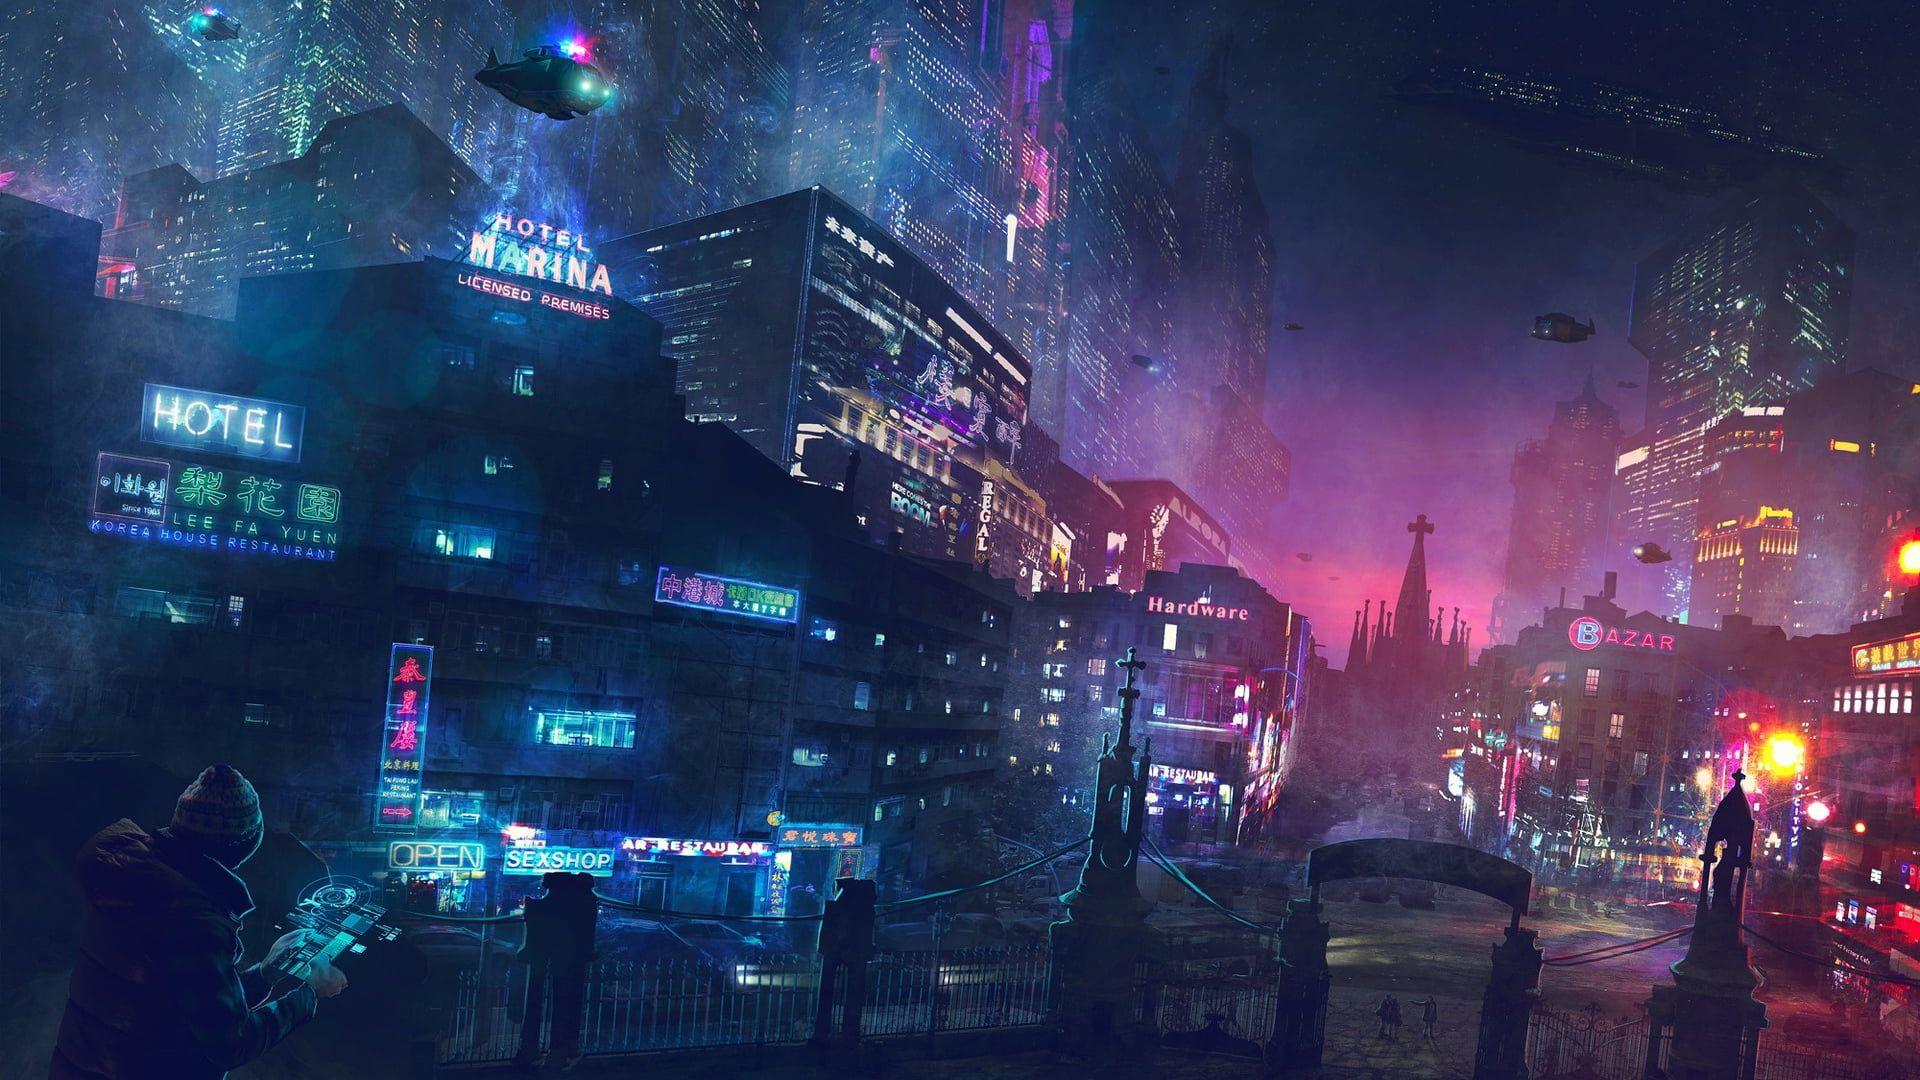 Building Digital Wallpaper Digital Art Science Fiction City Cyberpunk 1080p Wallpaper Hdwallpaper Desktop In 2020 Cyberpunk City Cyberpunk Art Futuristic City